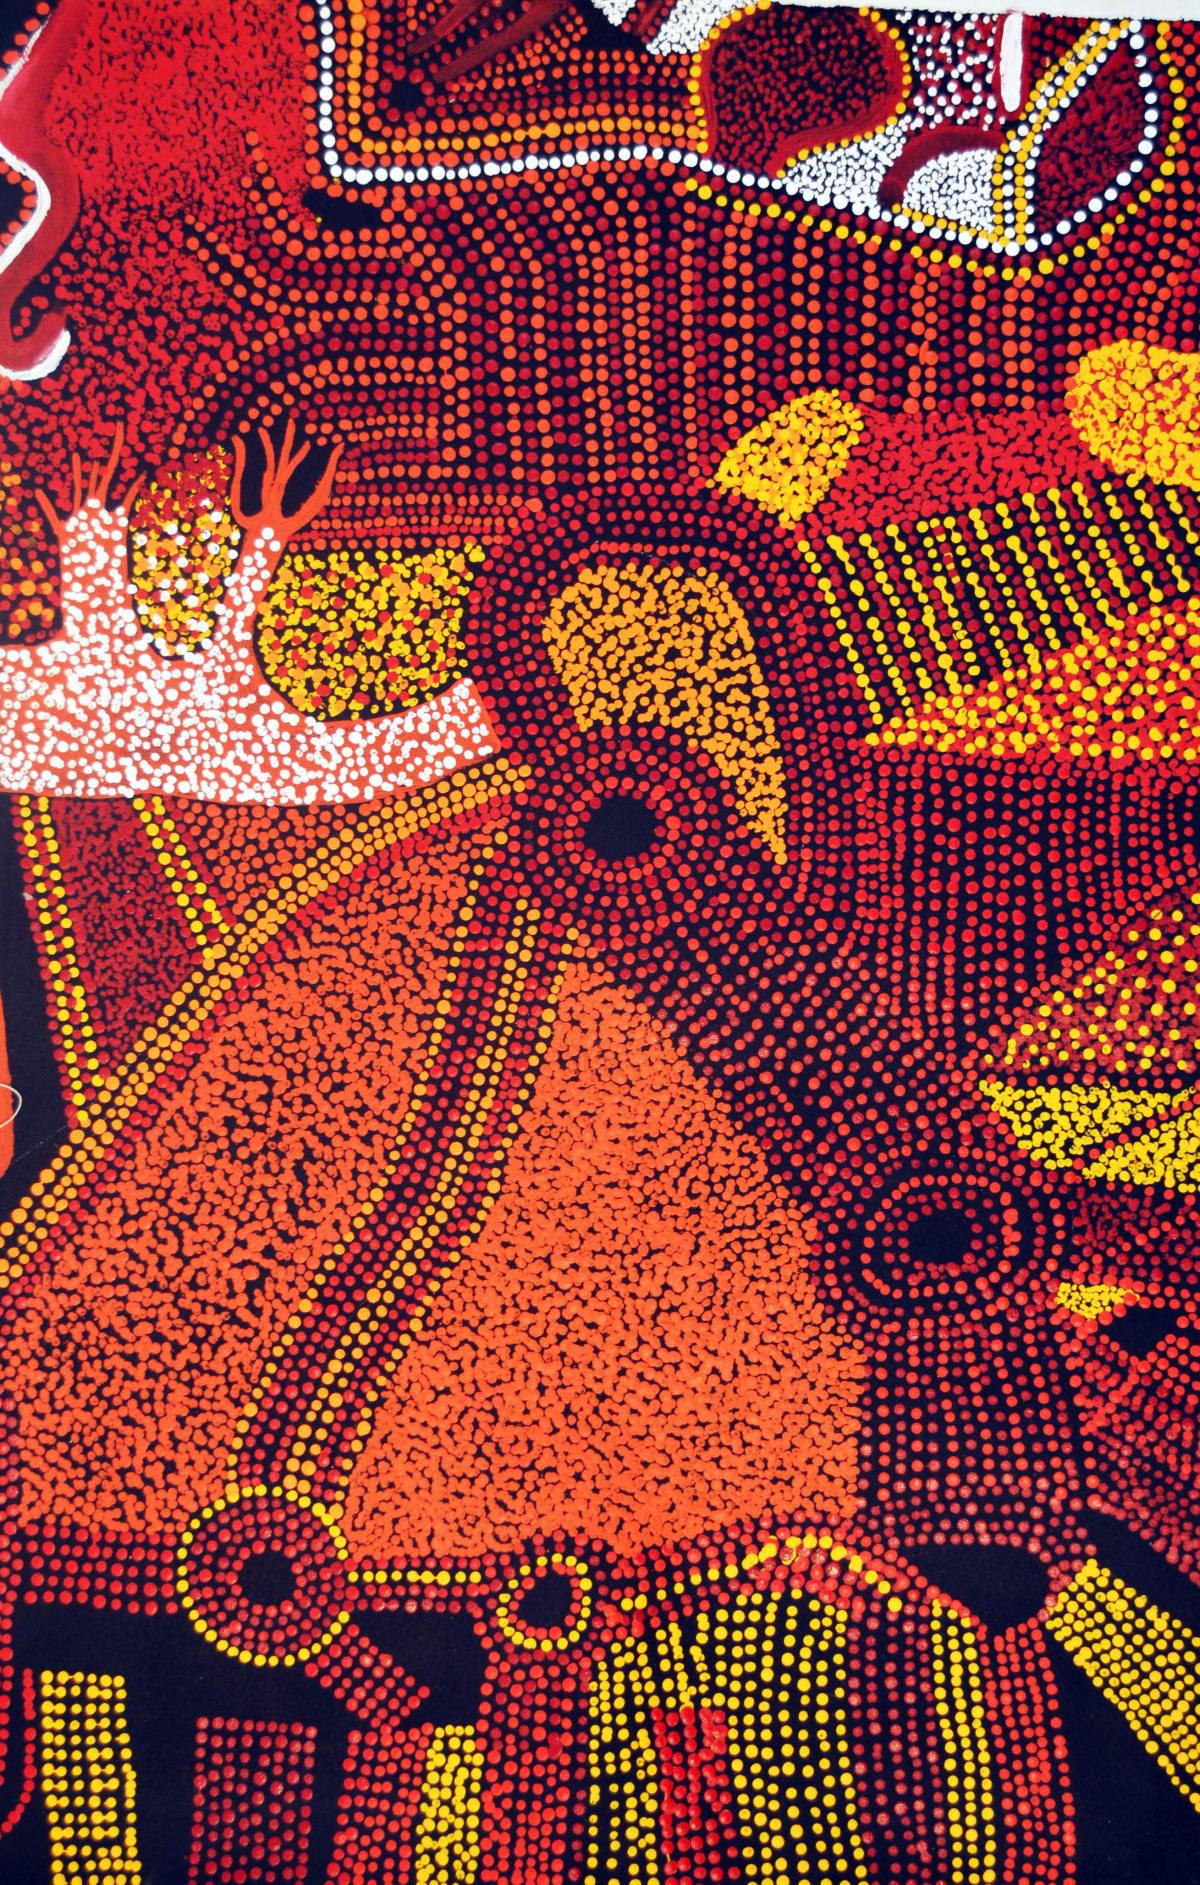 Bradley Tunkin Kalaya Tjukurpa (Emu Dreaming) acrylic on canvas 91 x 61 cm